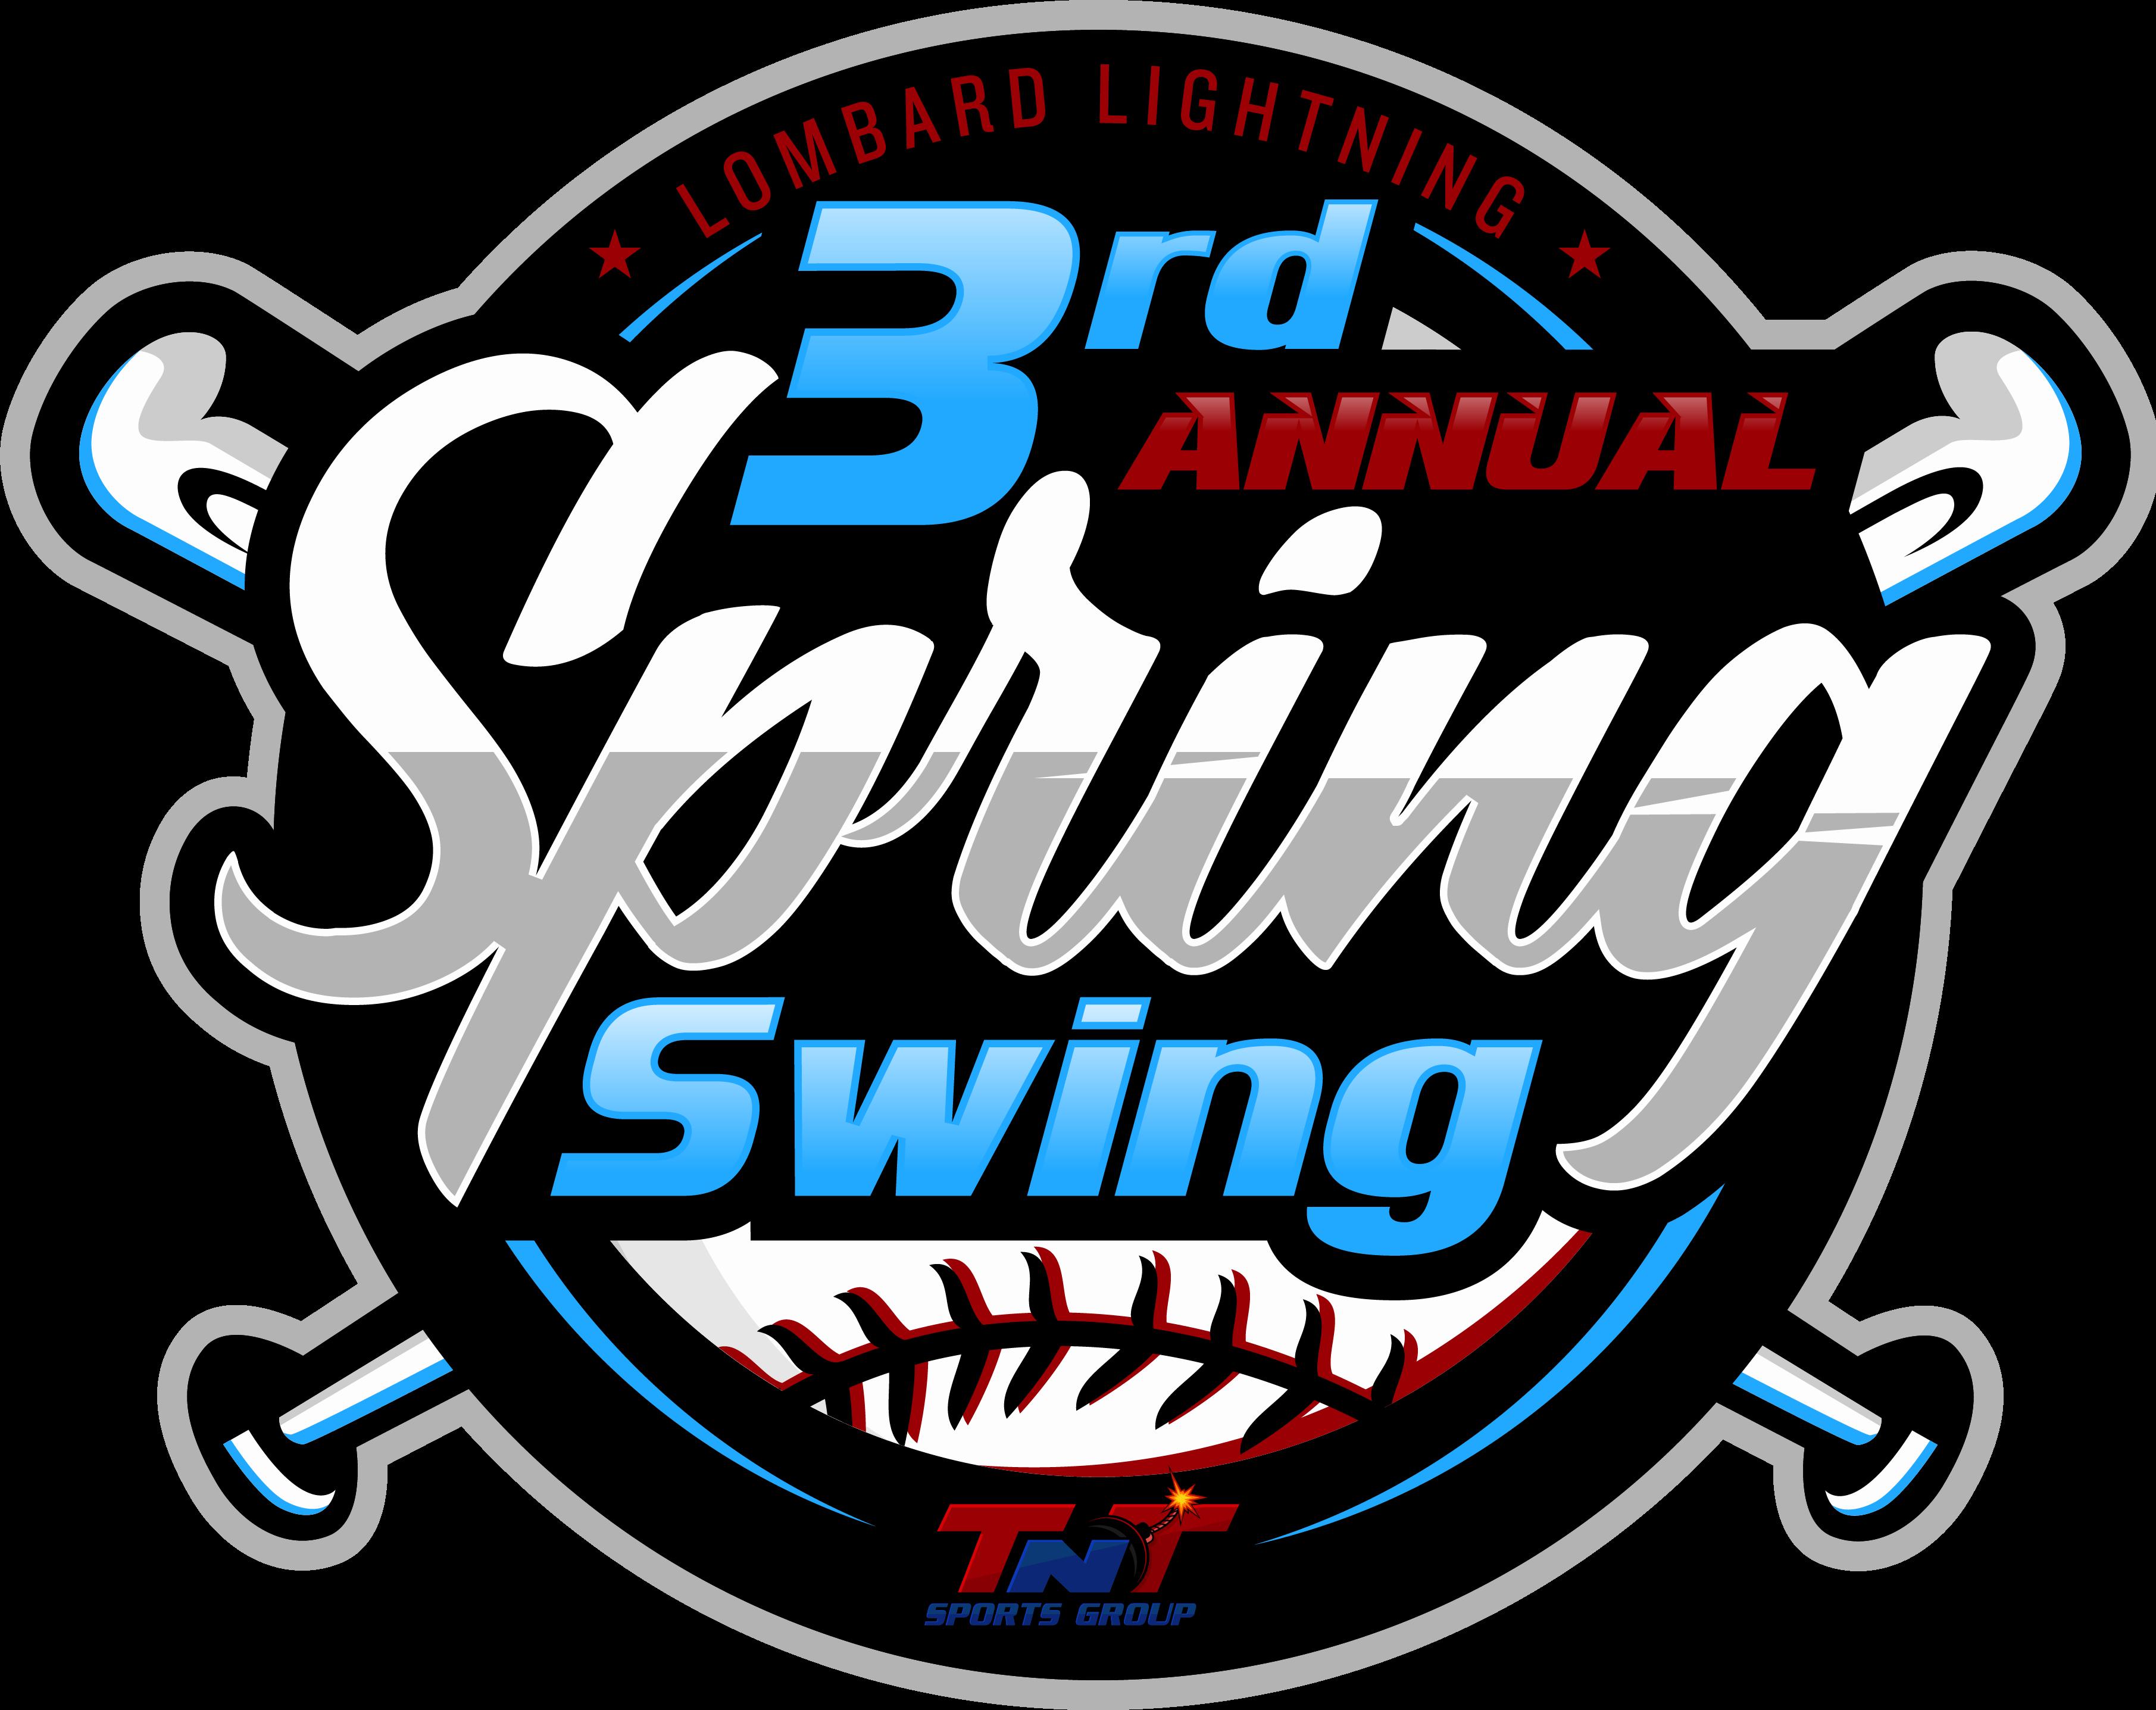 Lombard Lightning Spring Swing